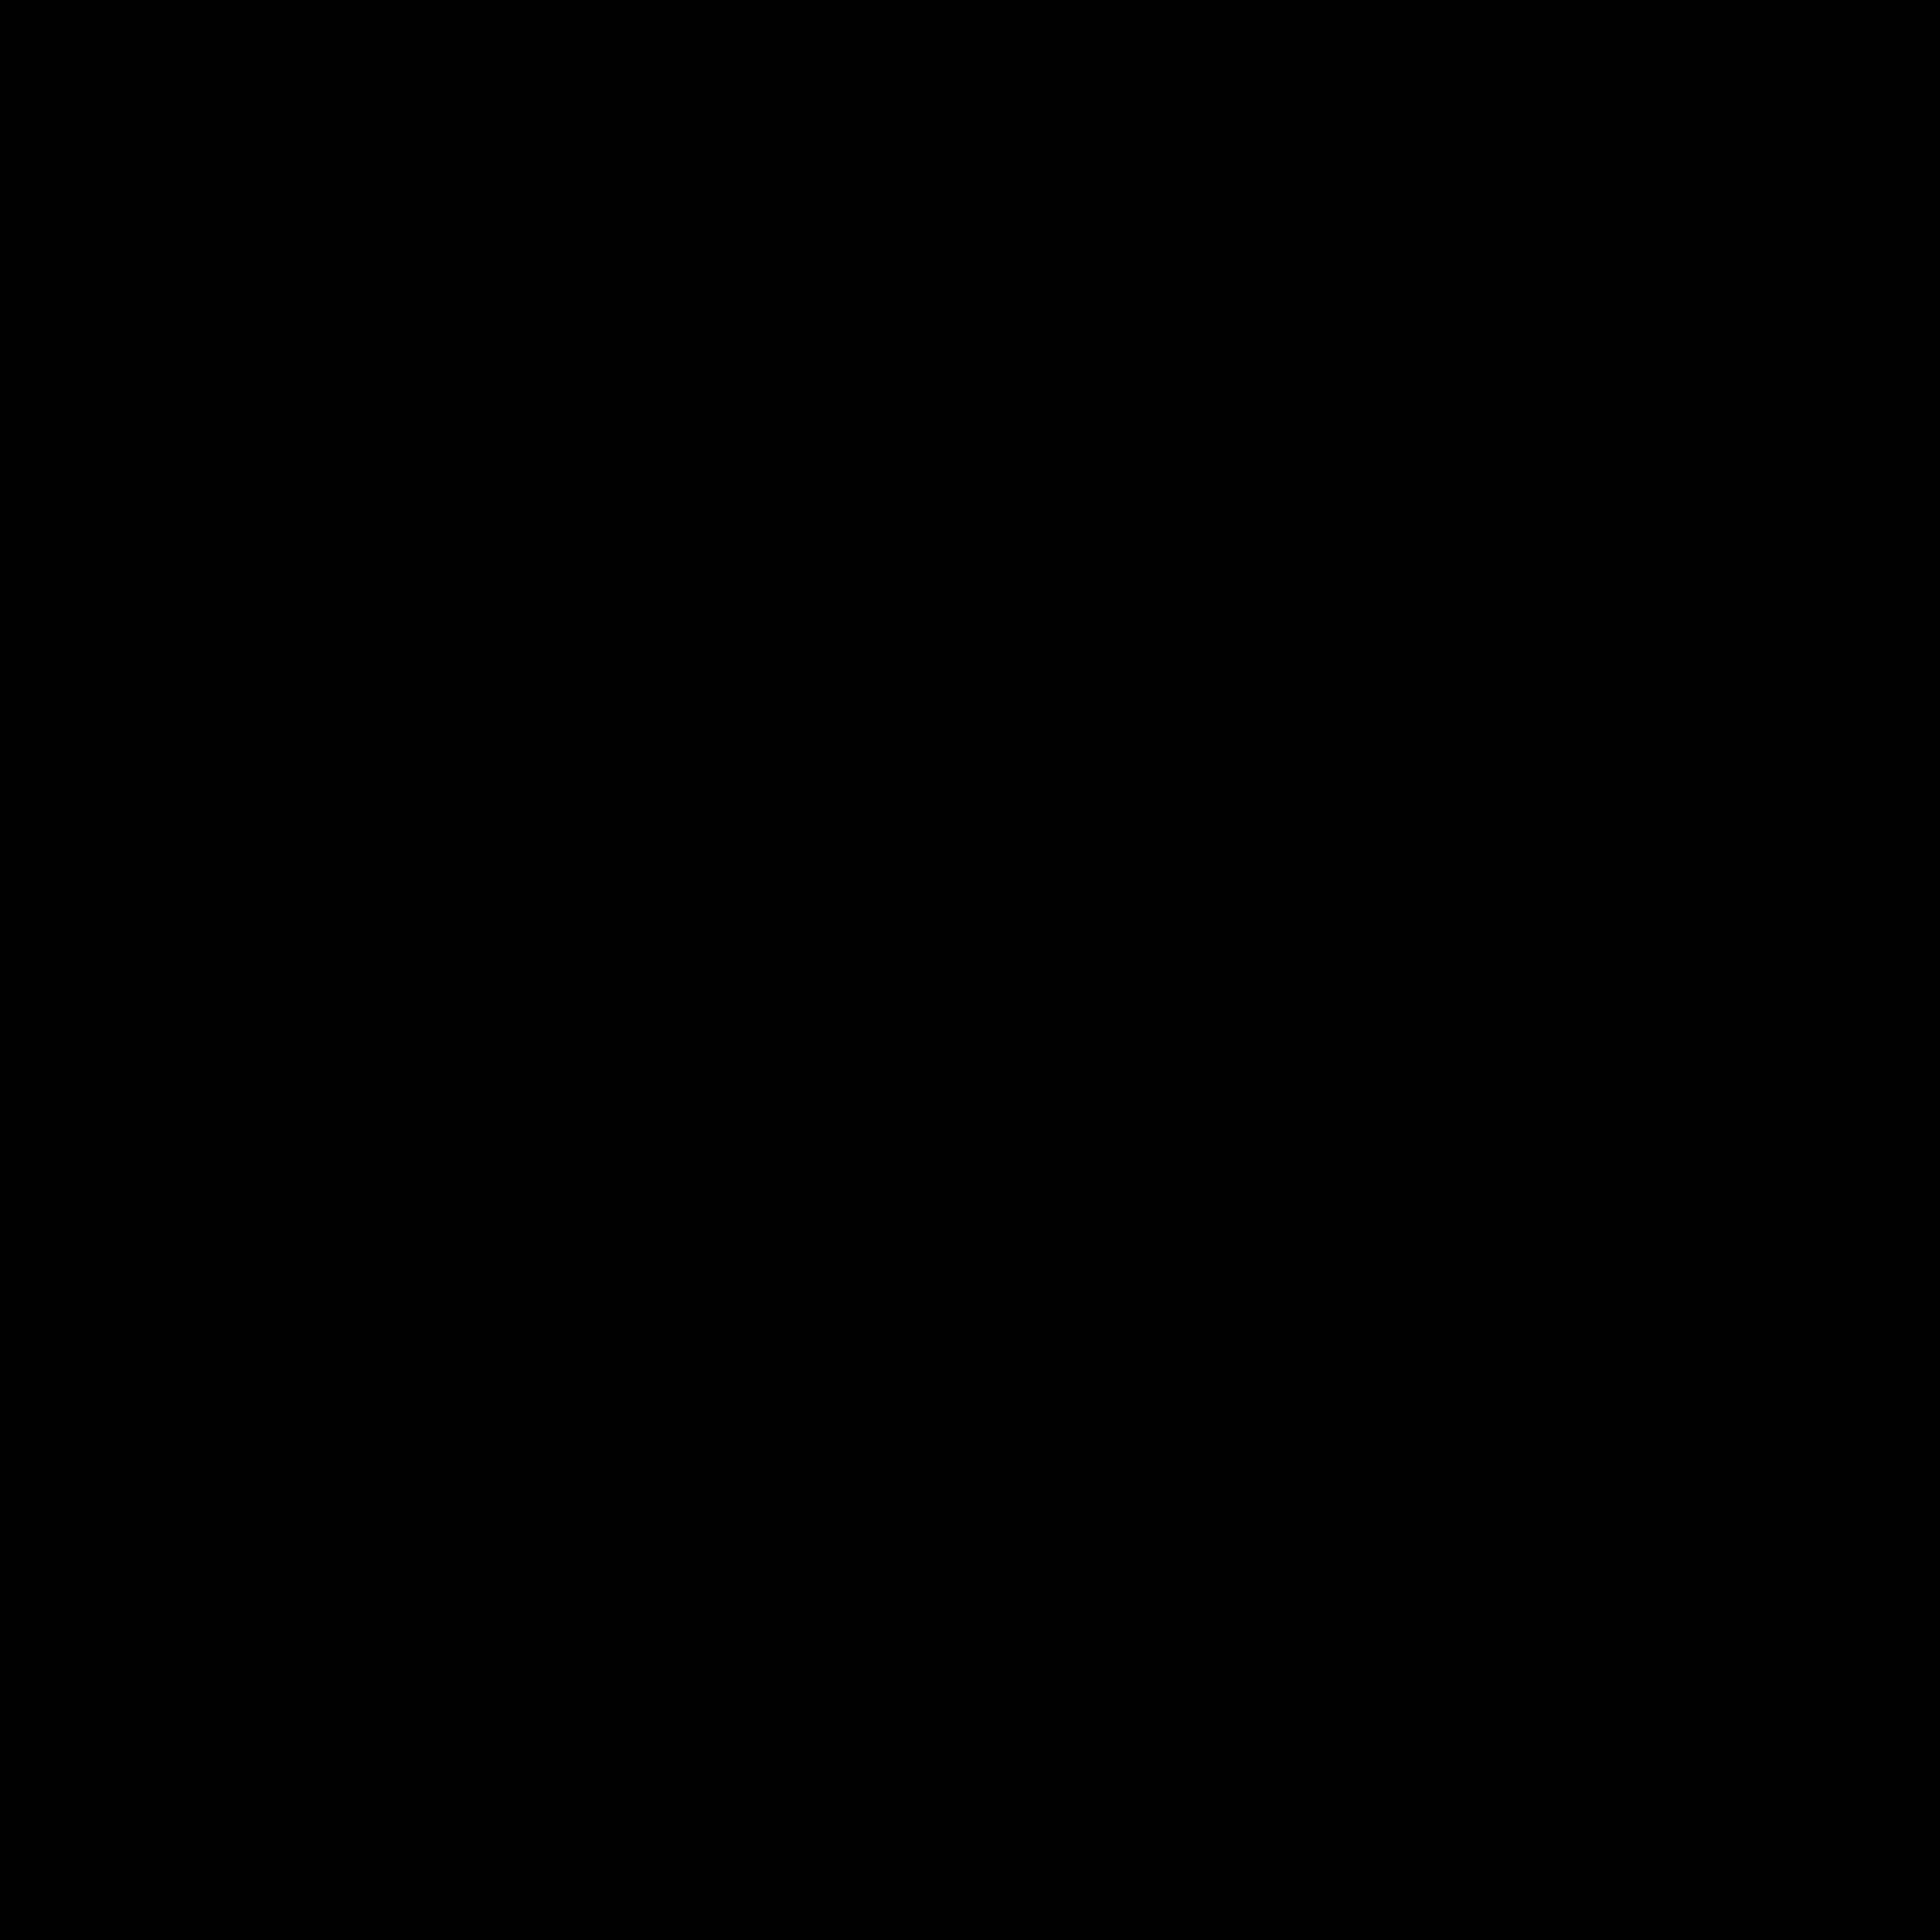 Cheveron snowflake clipart banner black and white Clipart - Victorian Style Frame 7 banner black and white